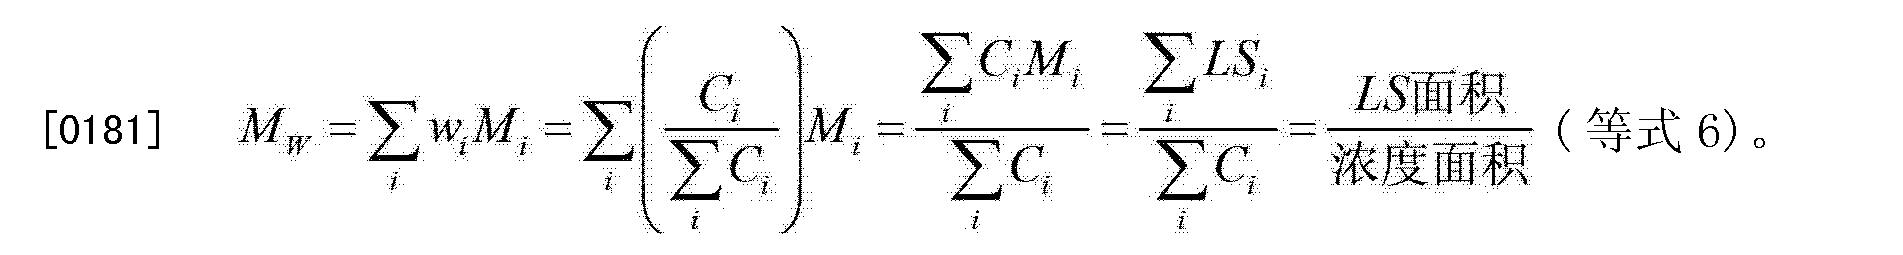 Figure CN102695735AD00221